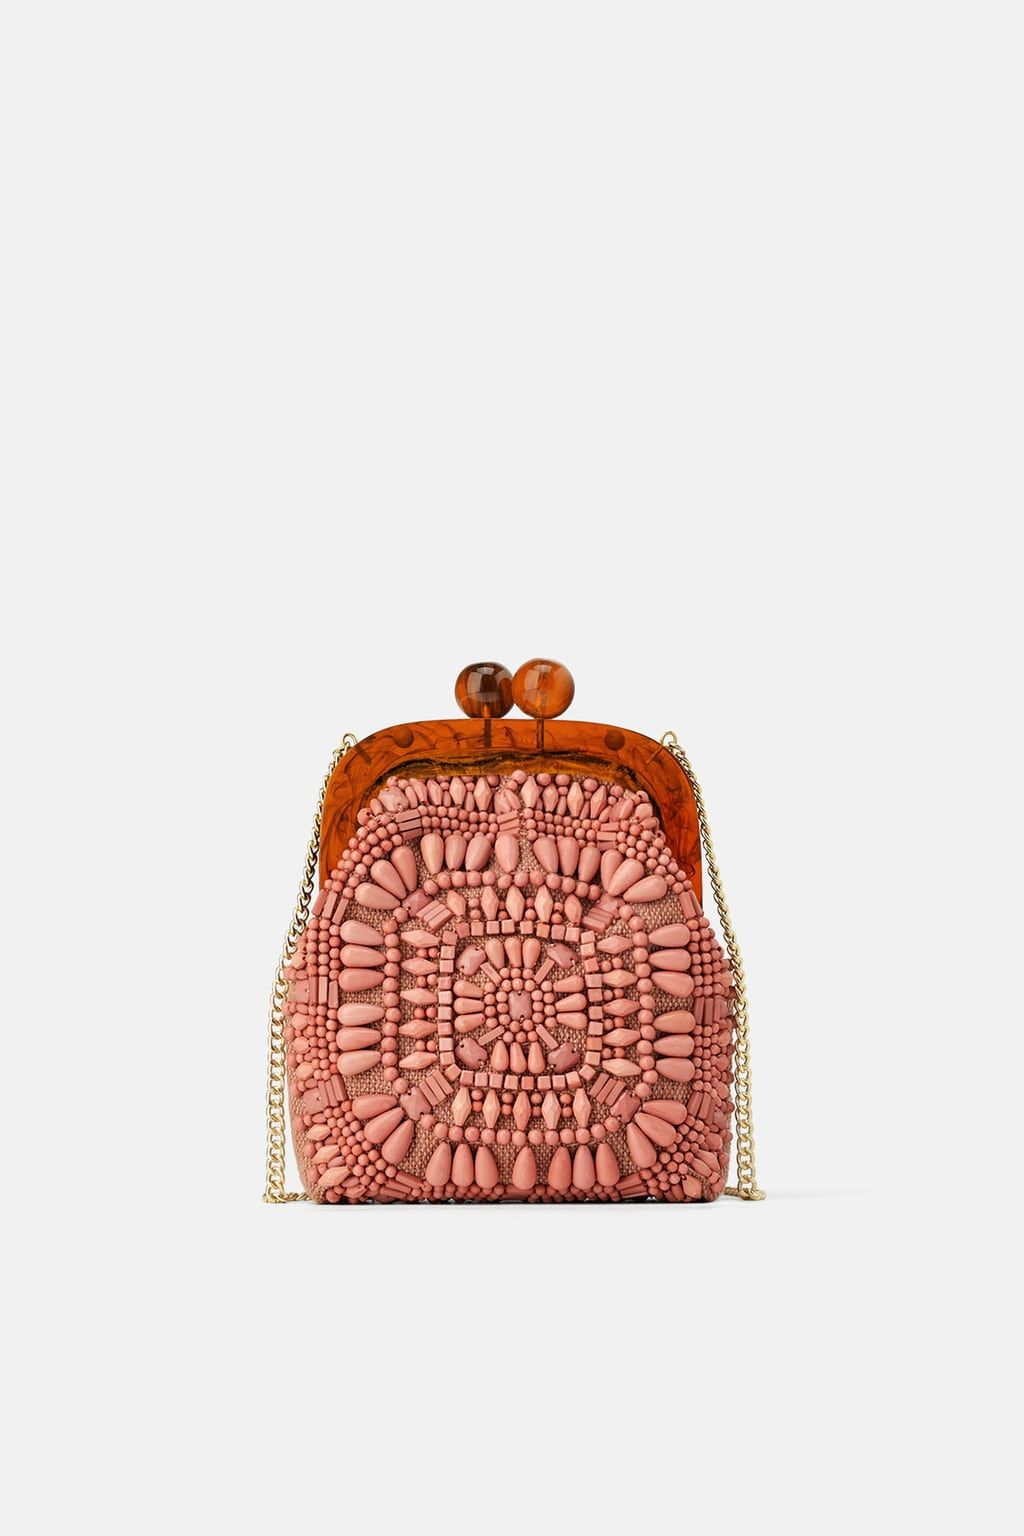 043992e017 Beaded mini crossbody bag with clasp in 2019 | clothes | Mini ...